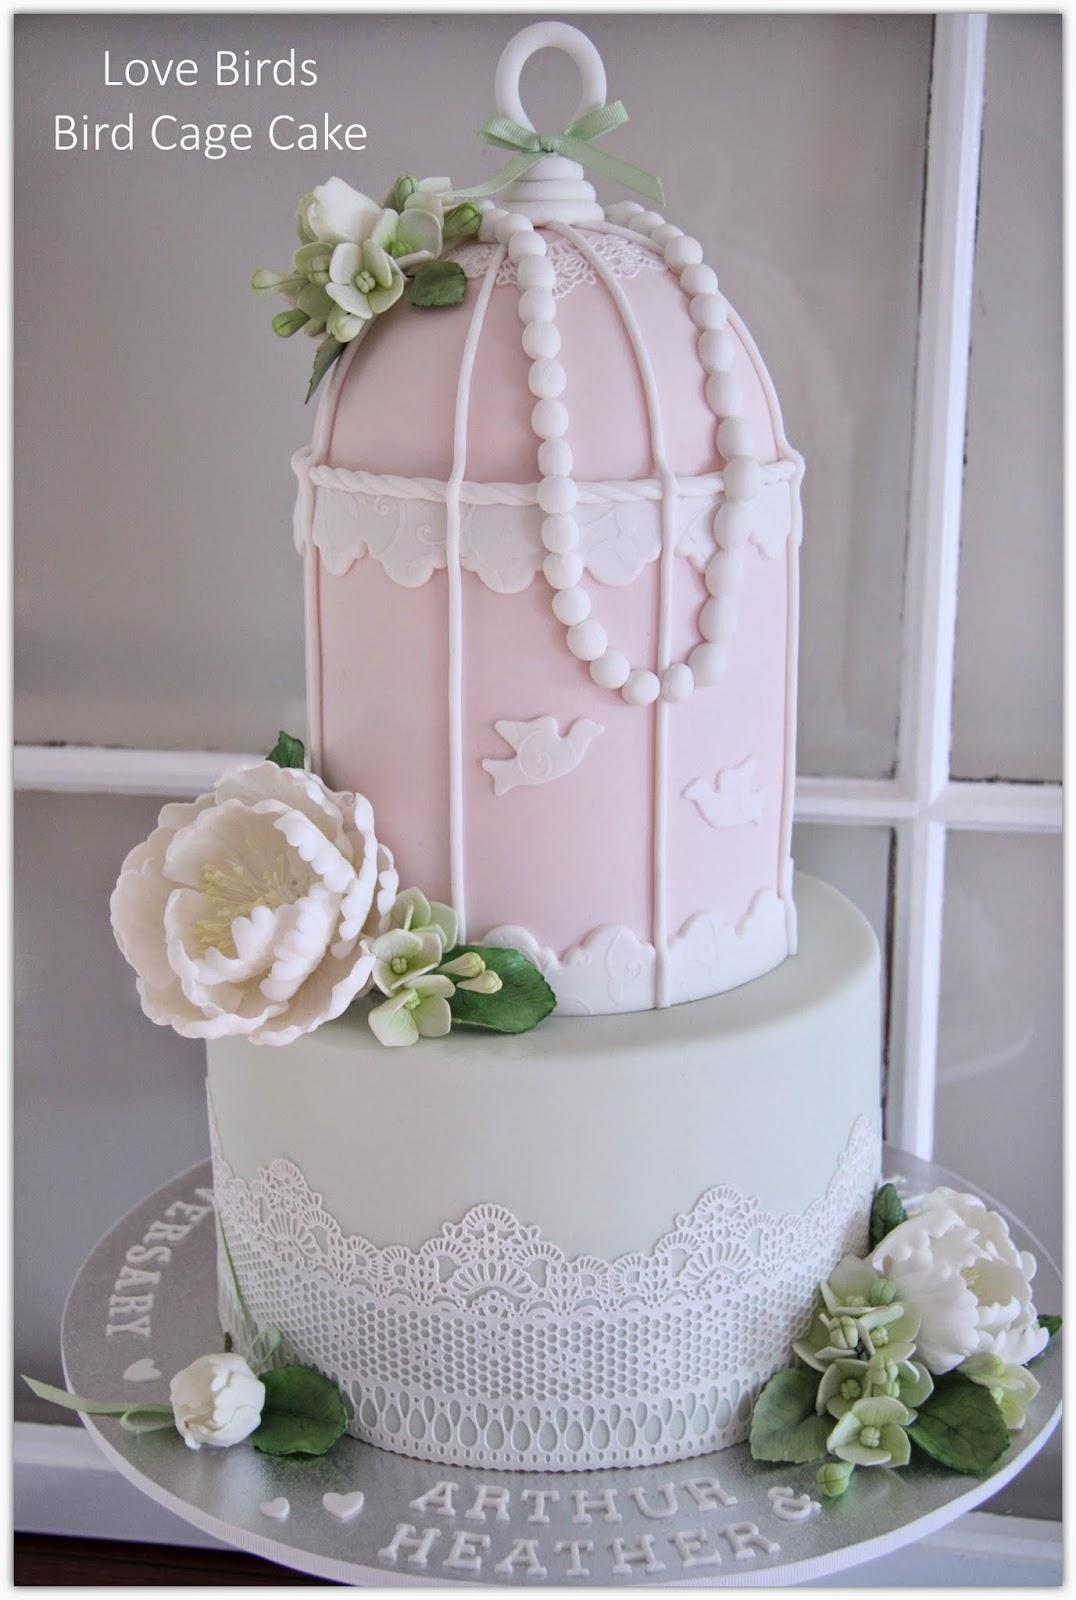 Leonie S Cakes And Parties Bird Cage Cake